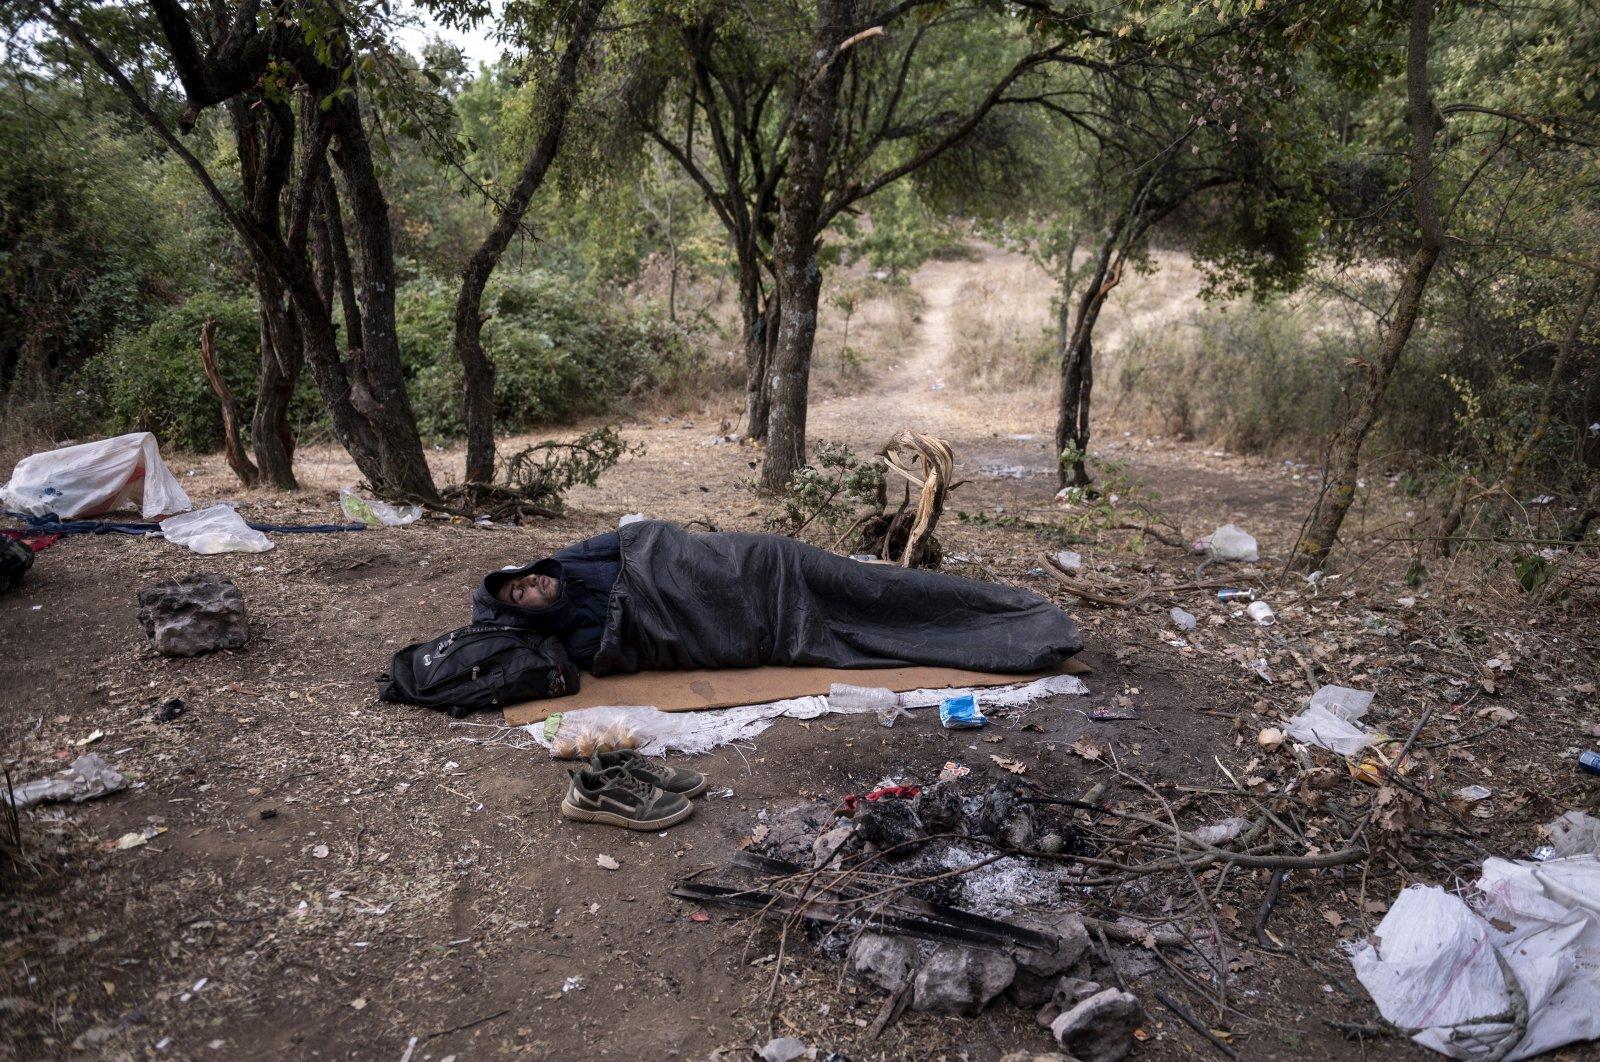 A Syrian migrant sleeps inside a forest near Ieropigi village, northern Greece, Sept. 28, 2021. (AP Photo)